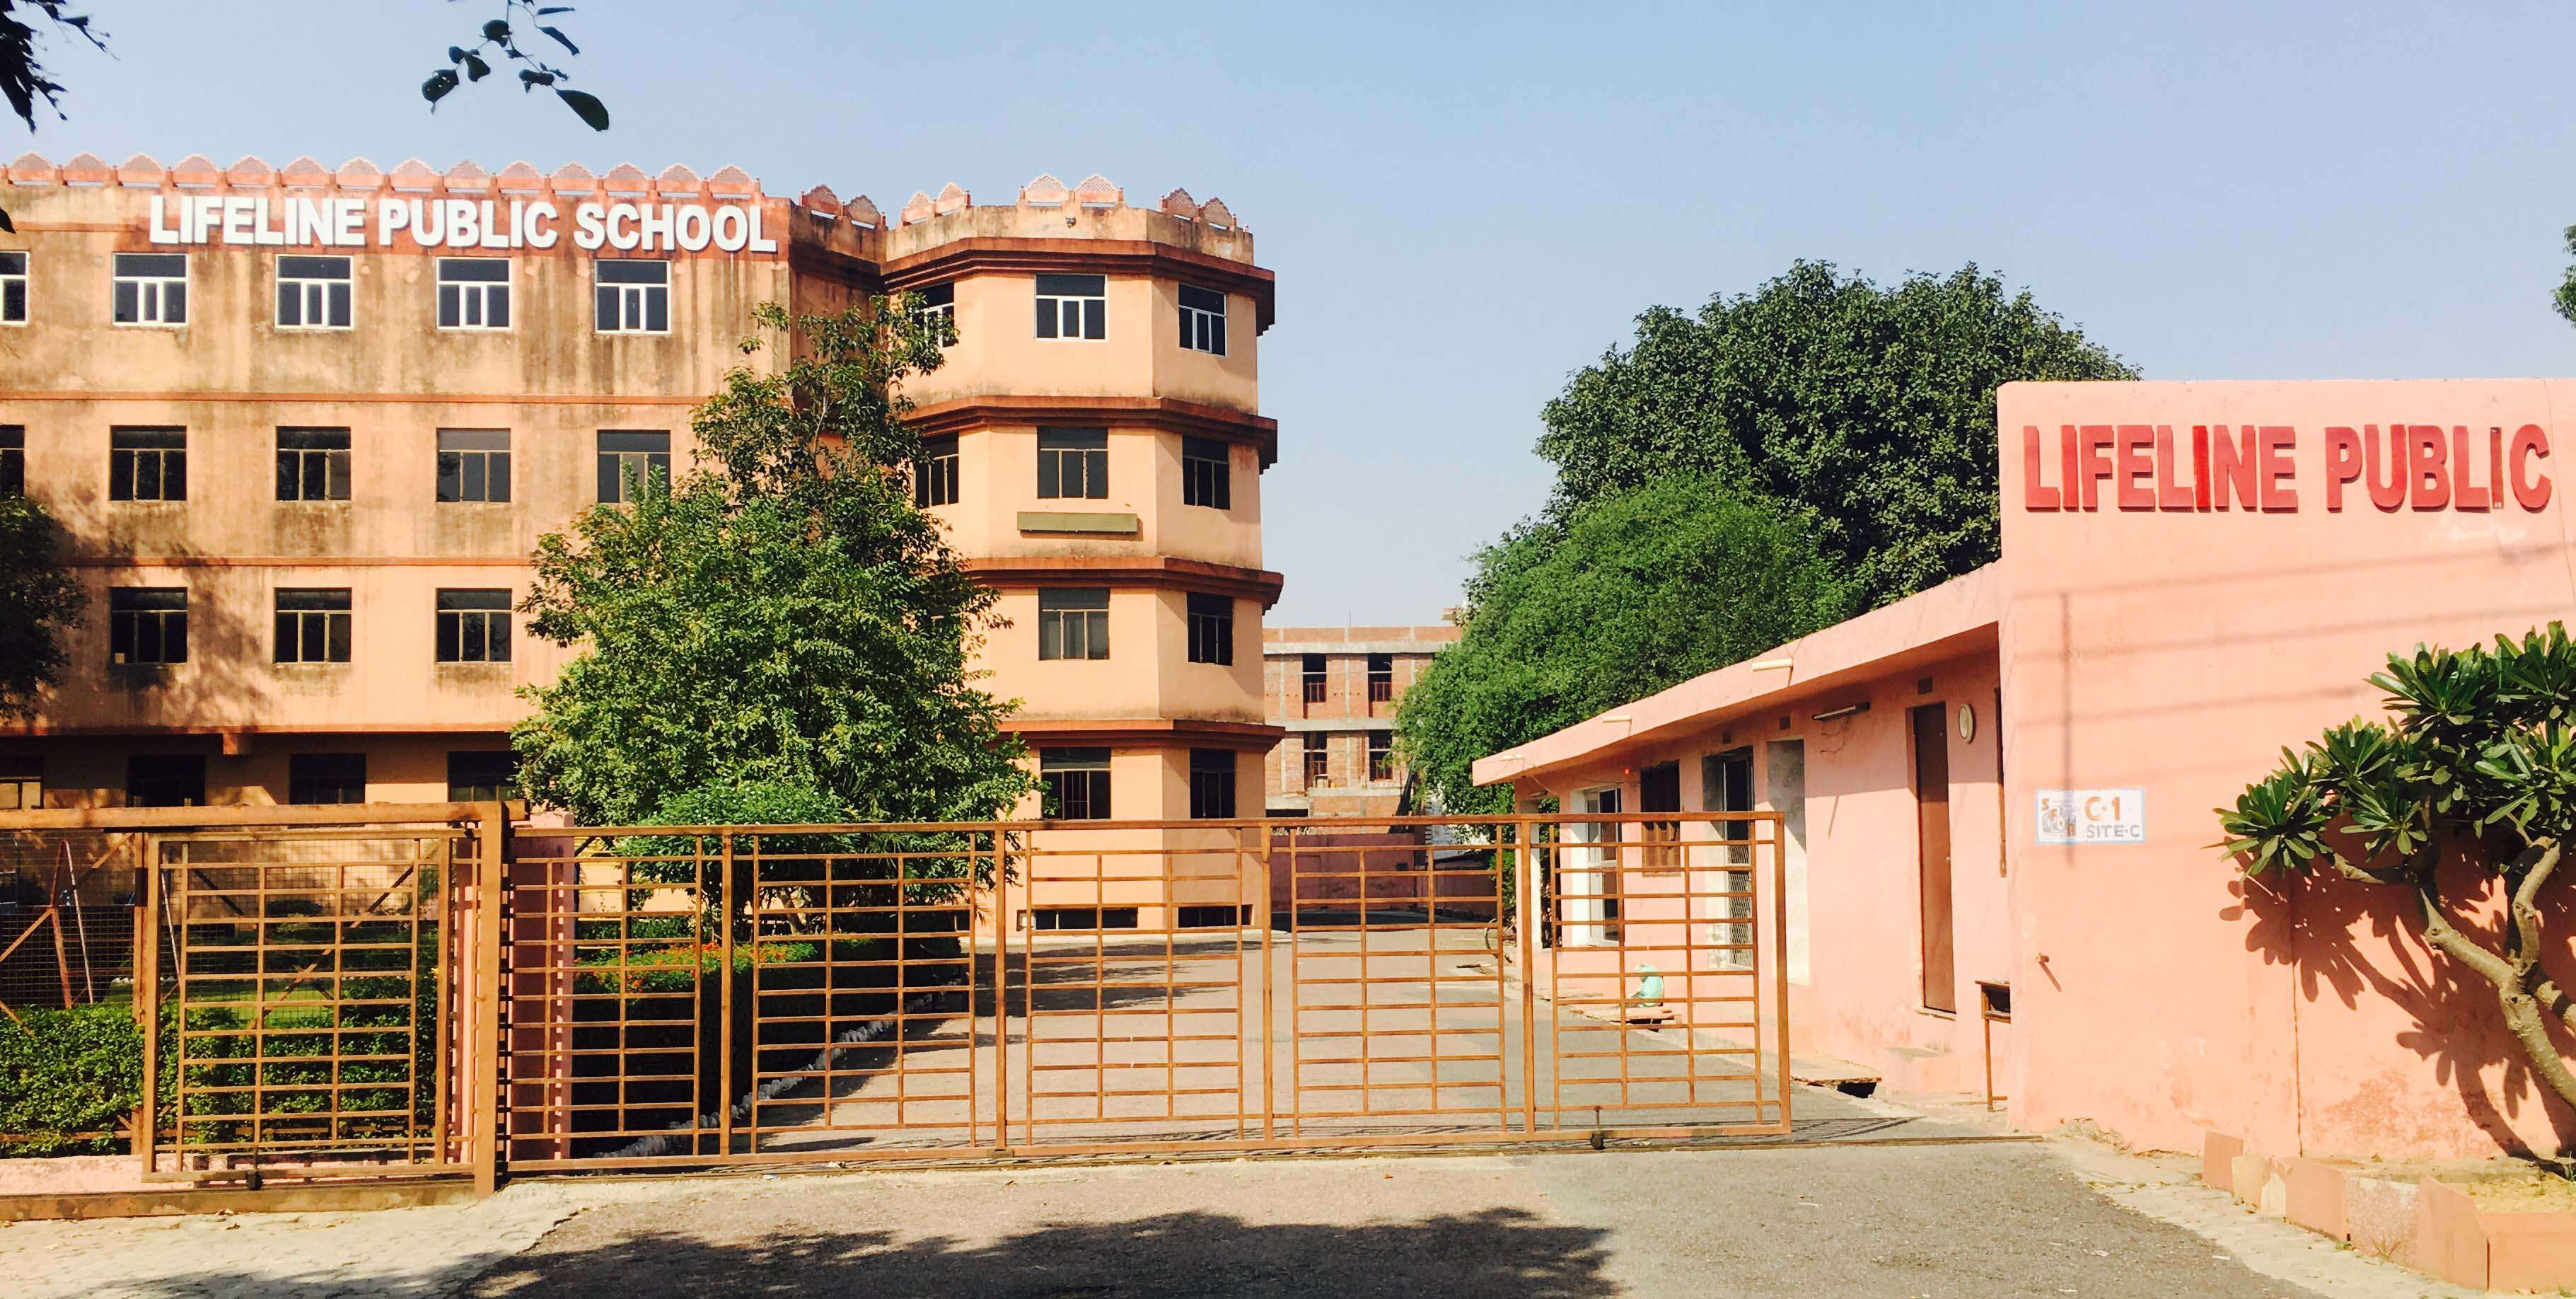 LIFELINE PUBLIC SCHOOL C 1 C 2 SITE C U P S I D C SIKANDARA 2131214